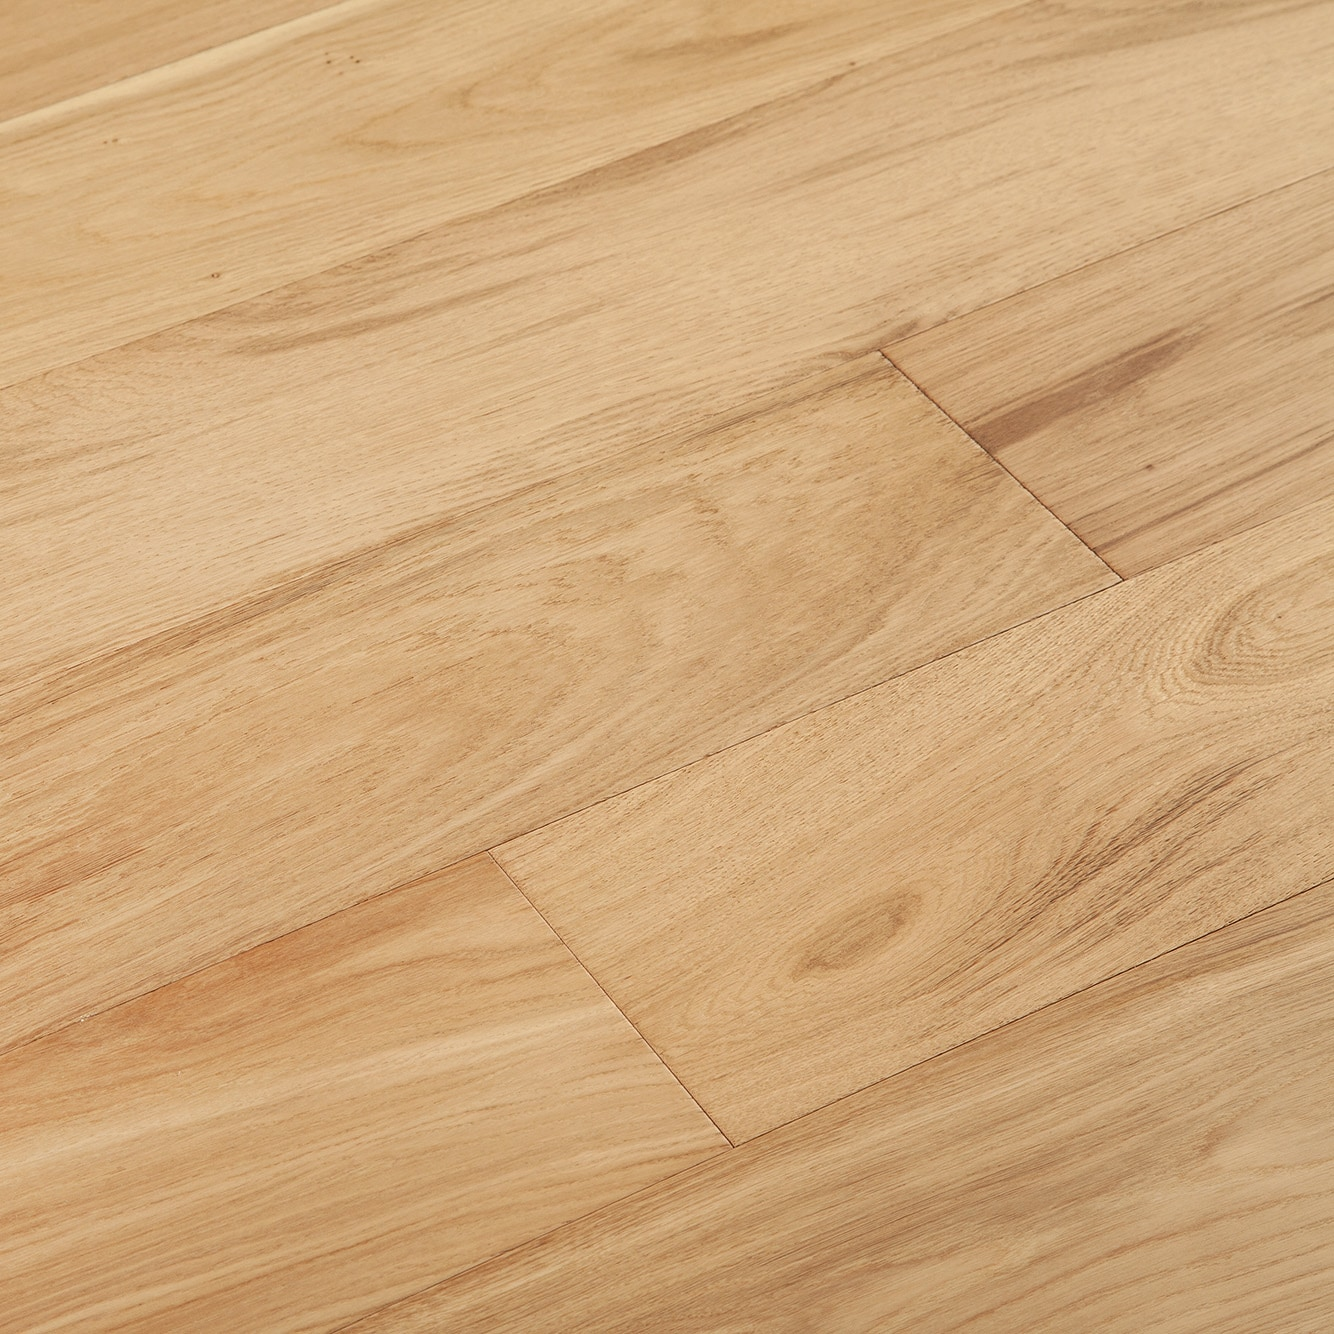 "Kerry / Oak / Wirebrushed / Builders Grade / 7 1/2"" Engineered Hardwood - LongHorn Collection 0"